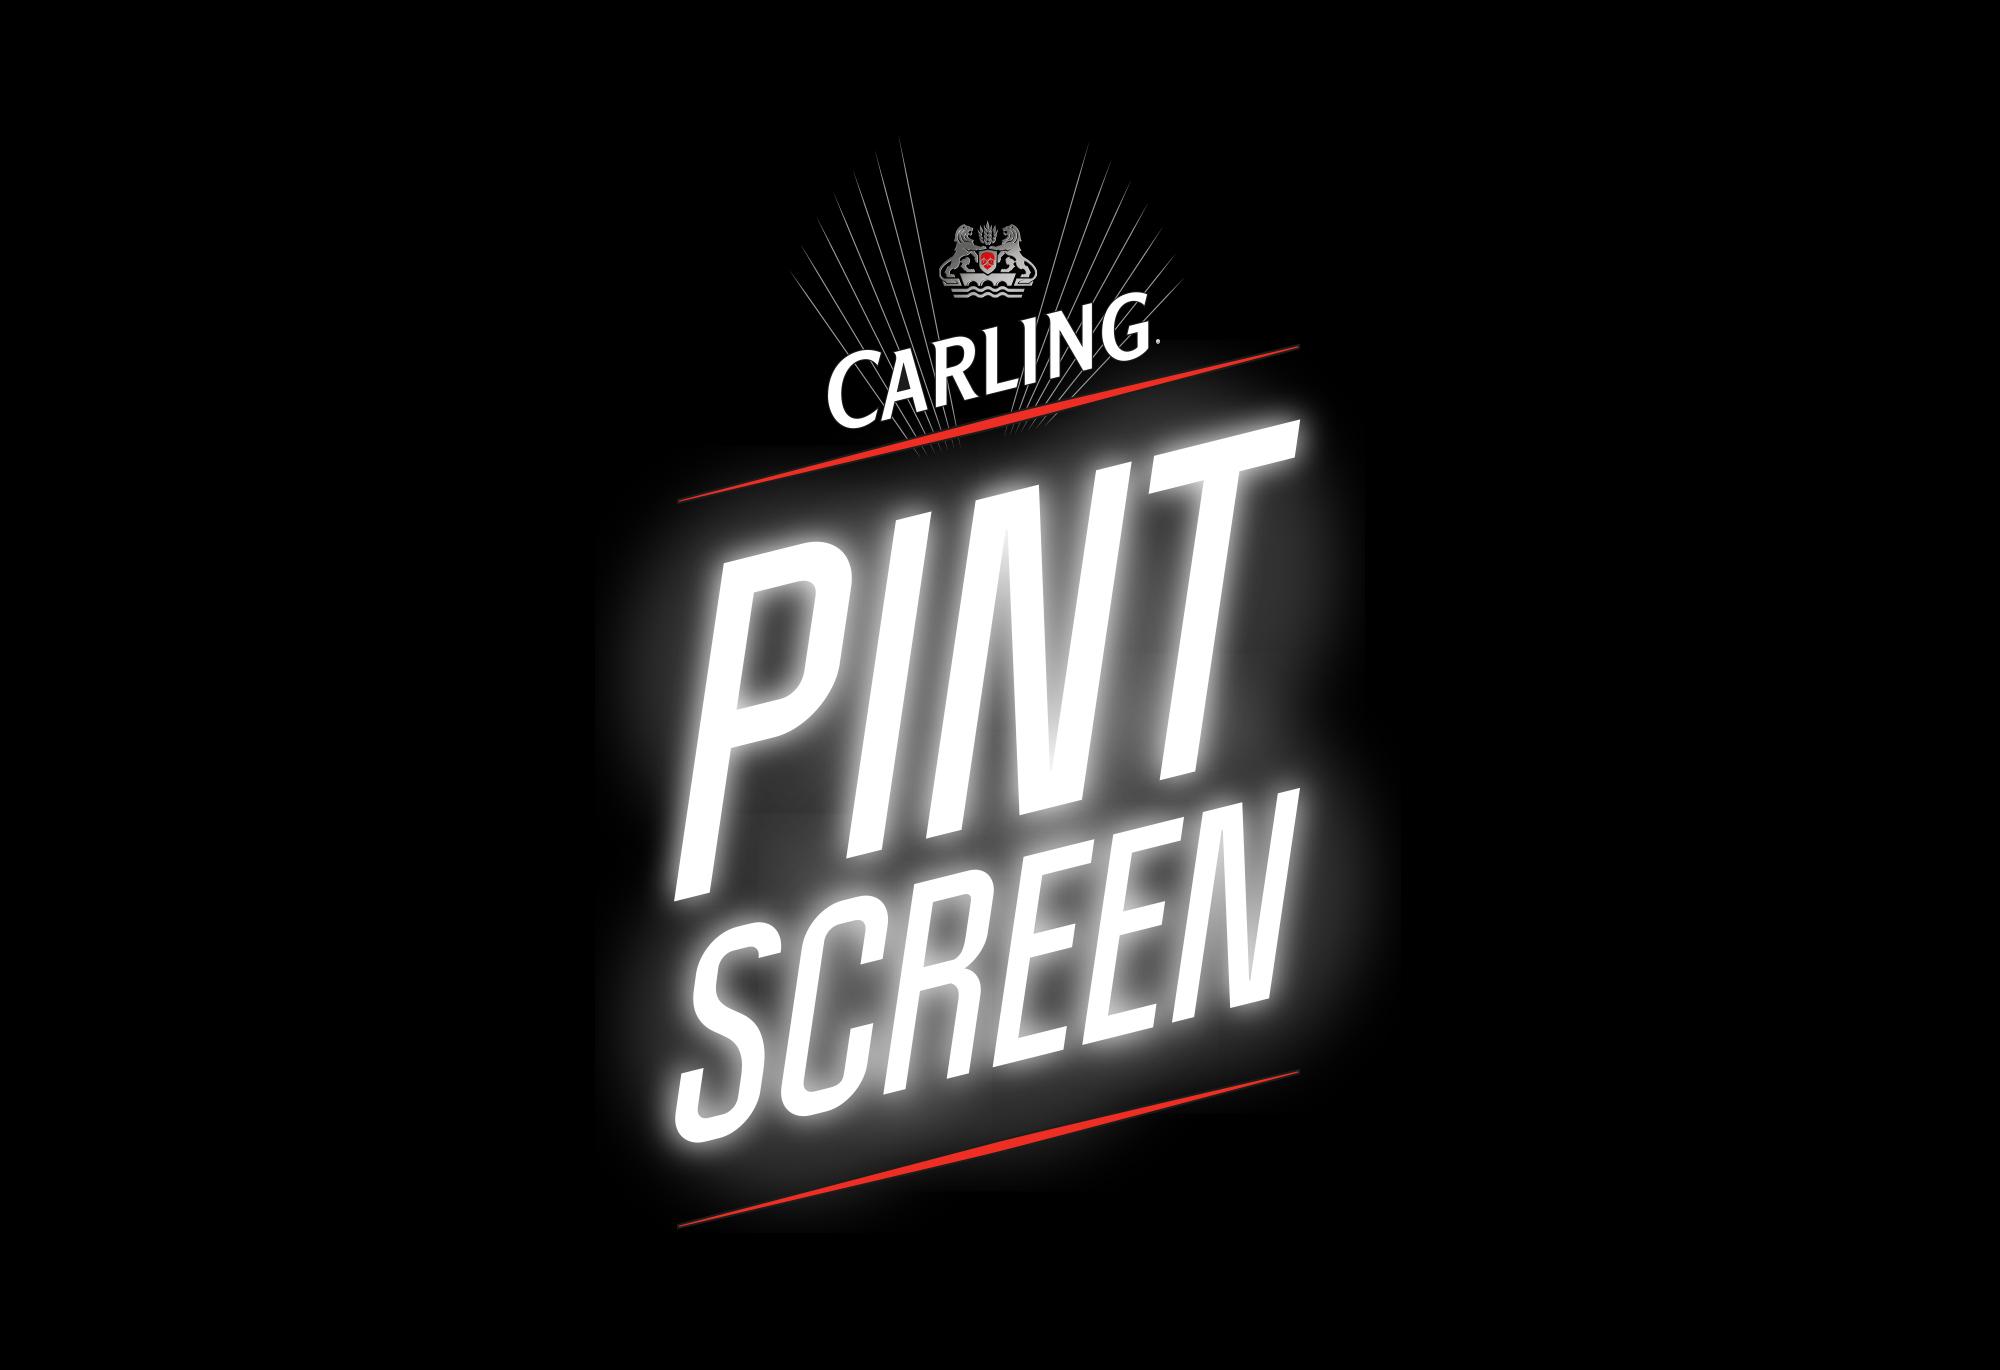 Carling Pint Screen logo